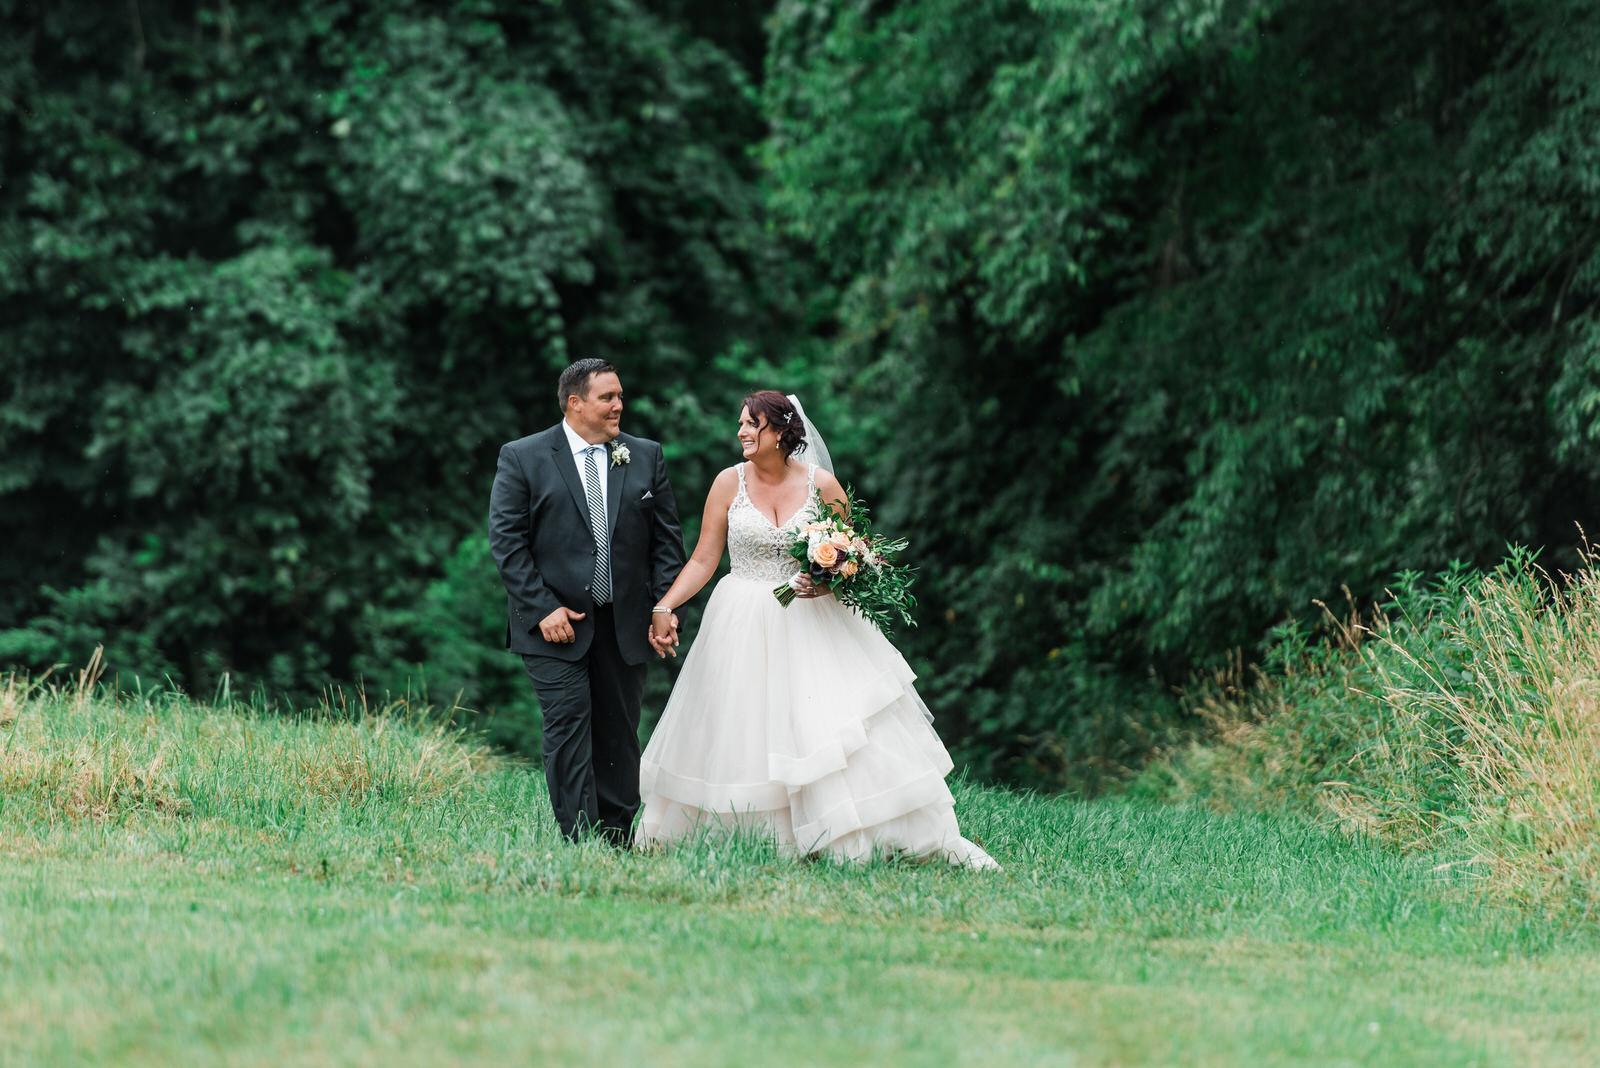 destiny-hill-farm-wedding-photography-4.jpg